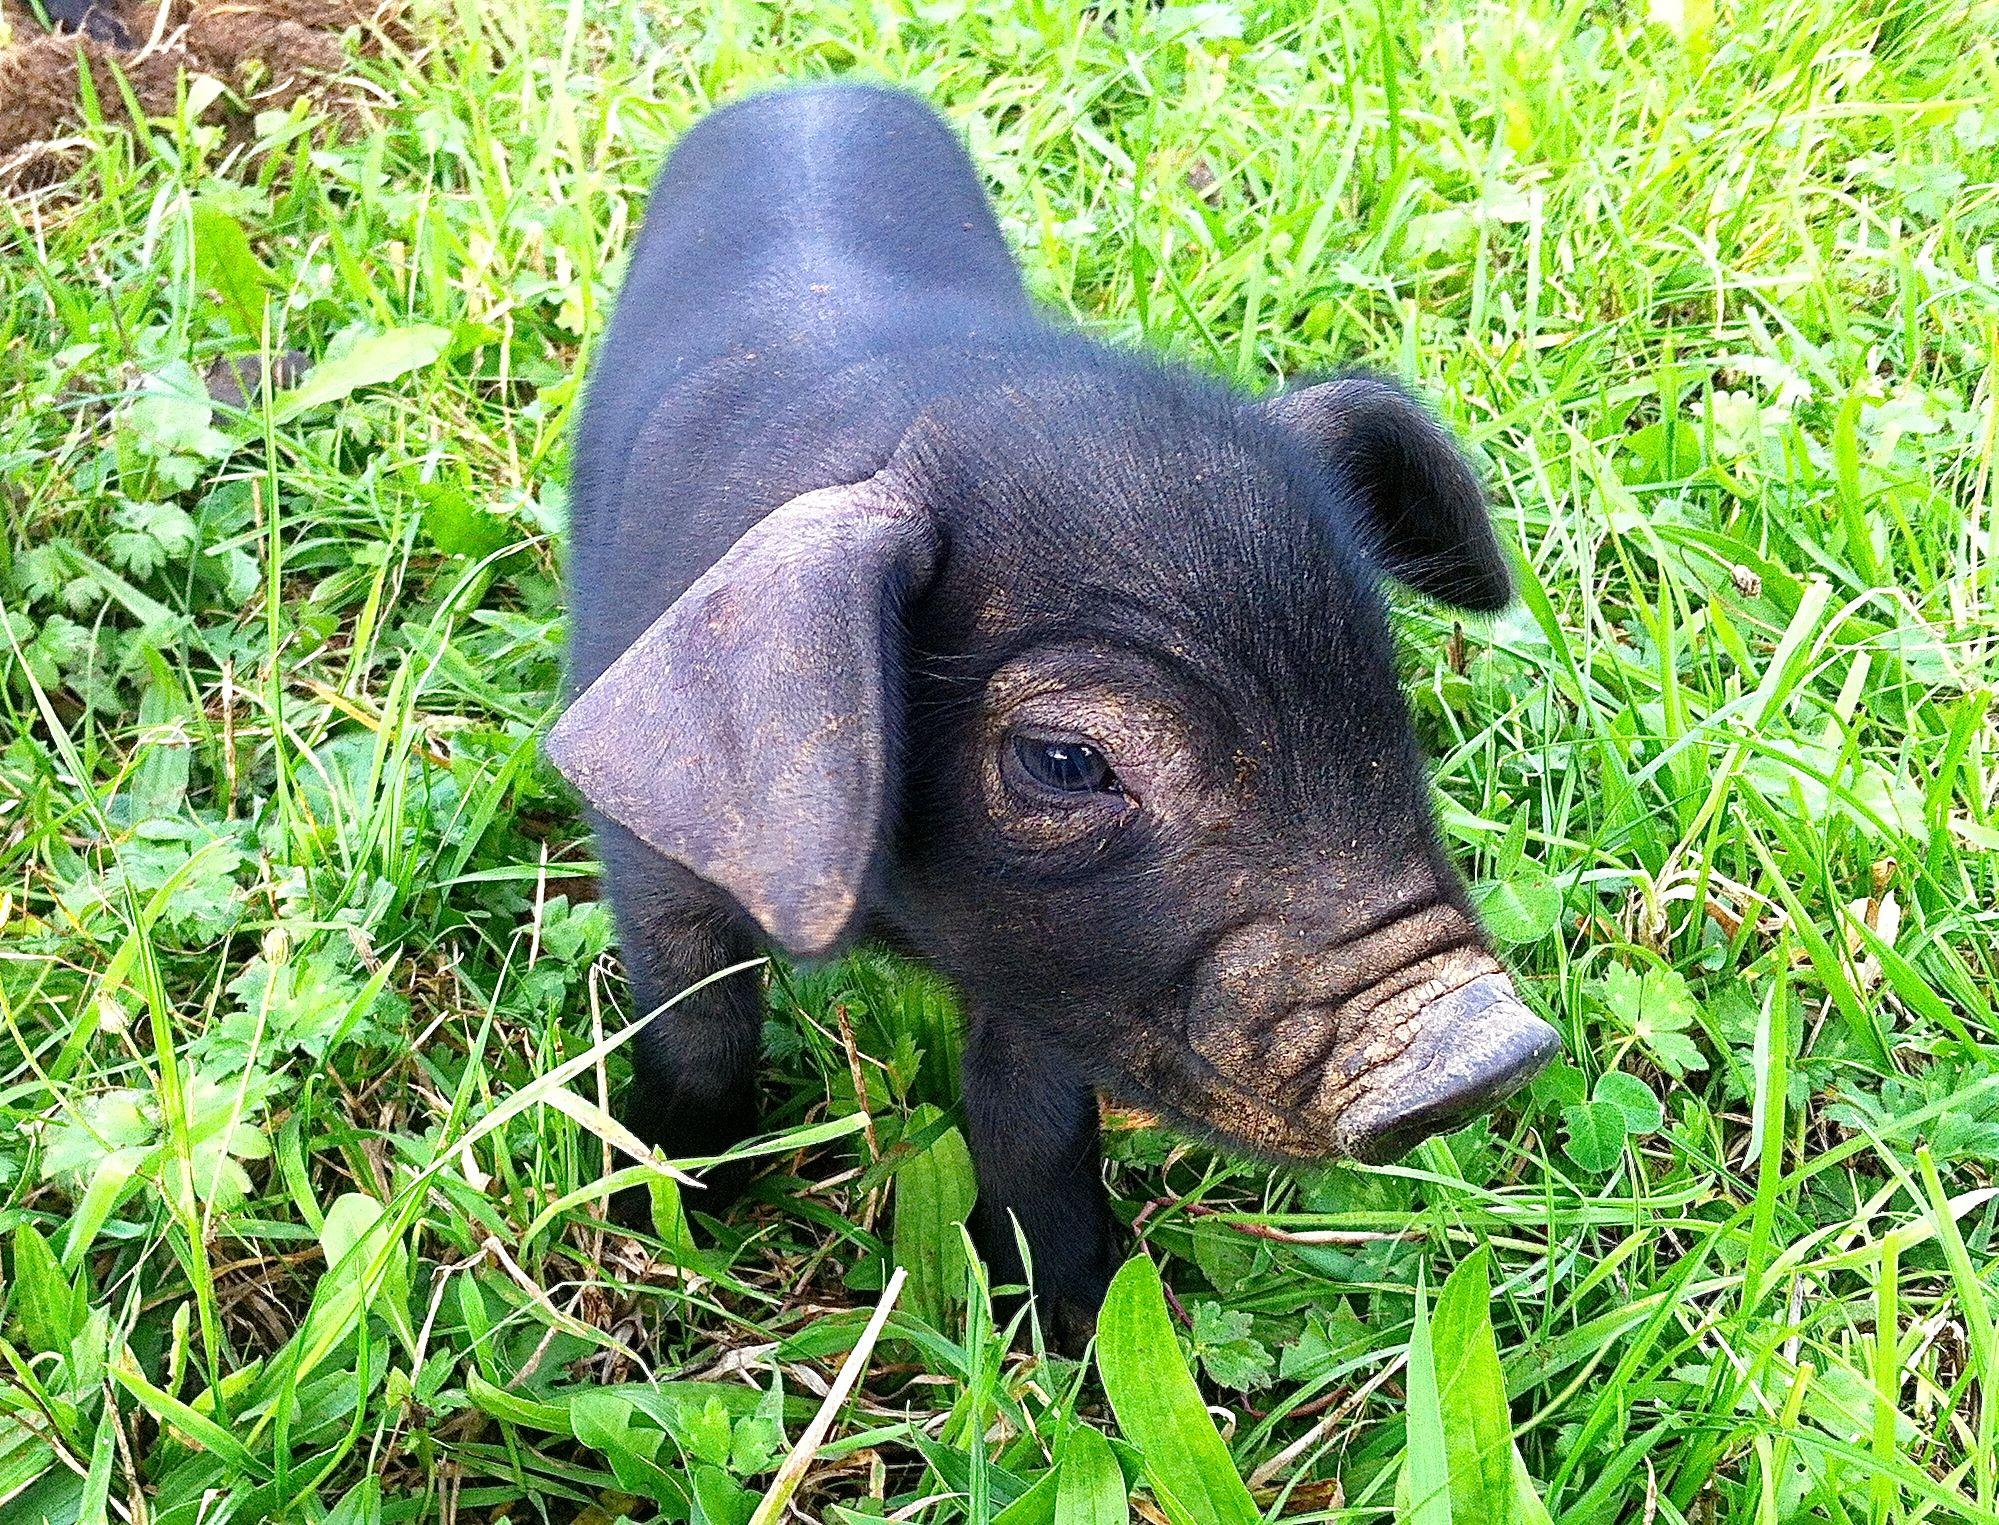 Large Black Piglet Large Black Is The Breed